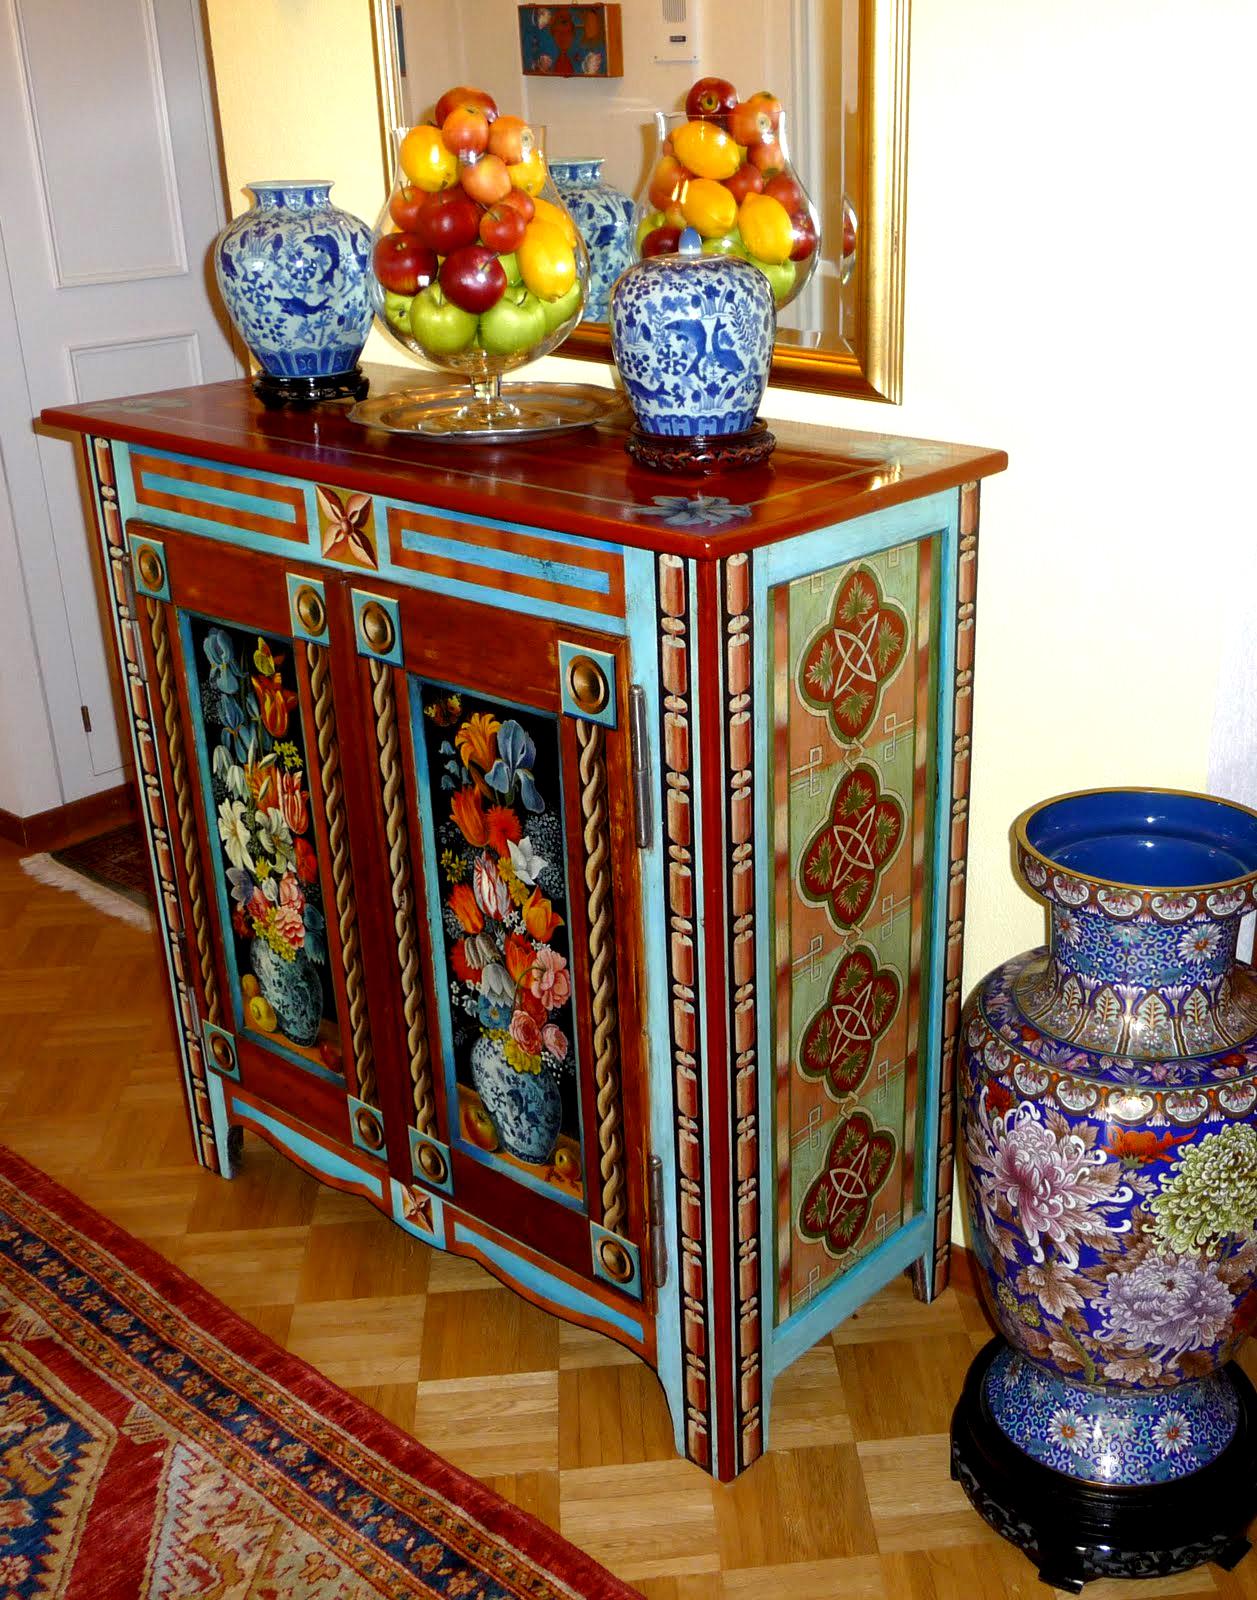 meubles peintsmichaela barasky michaela barasky. Black Bedroom Furniture Sets. Home Design Ideas